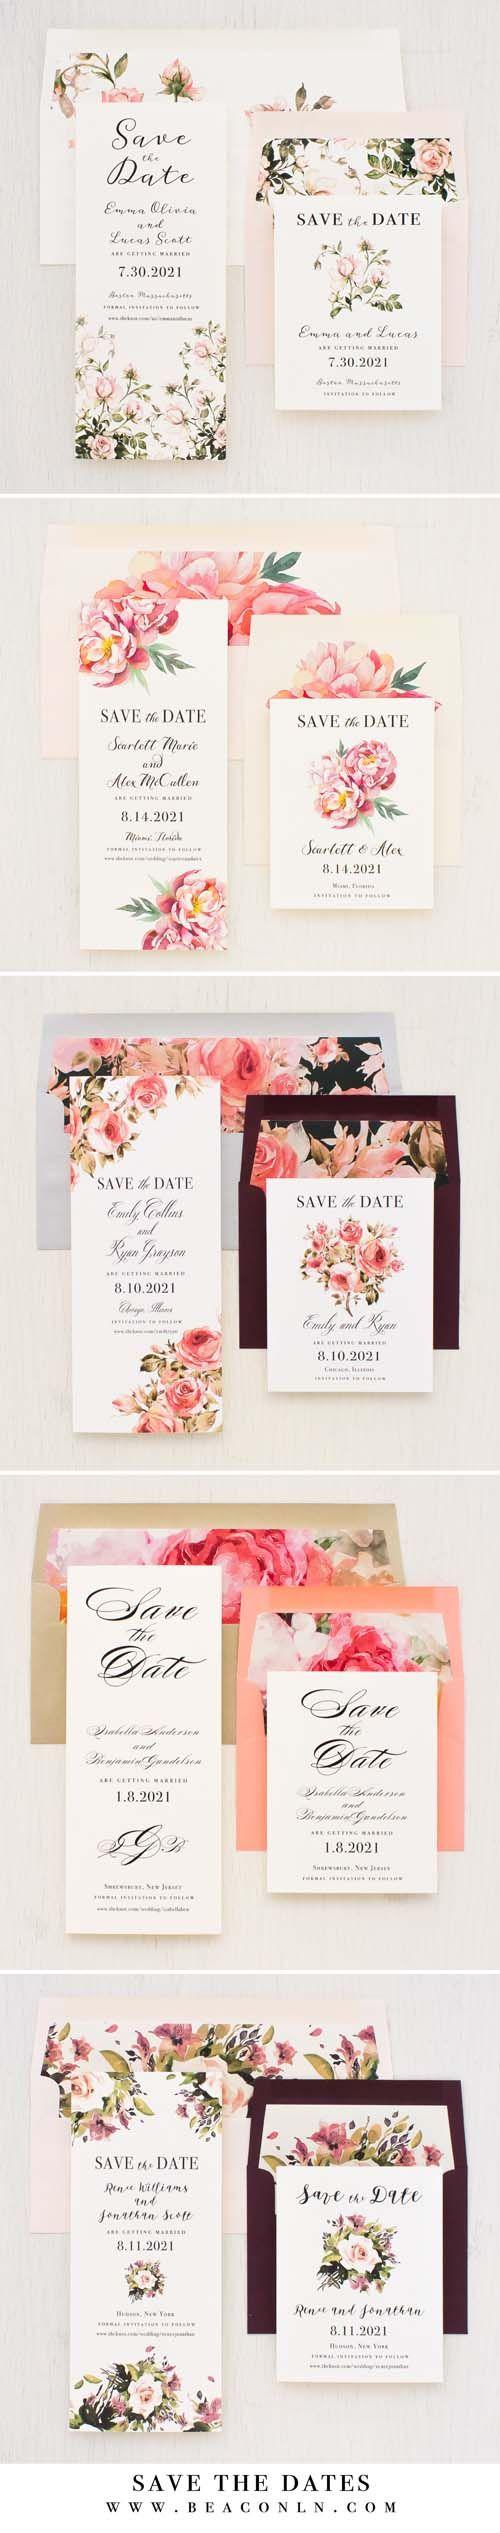 best price wedding invitations%0A Floral Wedding Invitations  Wedding Stationery  Wedding Paper  Wedding Cards   Wedding Bells  Wedding Tips  Wedding Planning  Wedding Stuff  Green Weddings